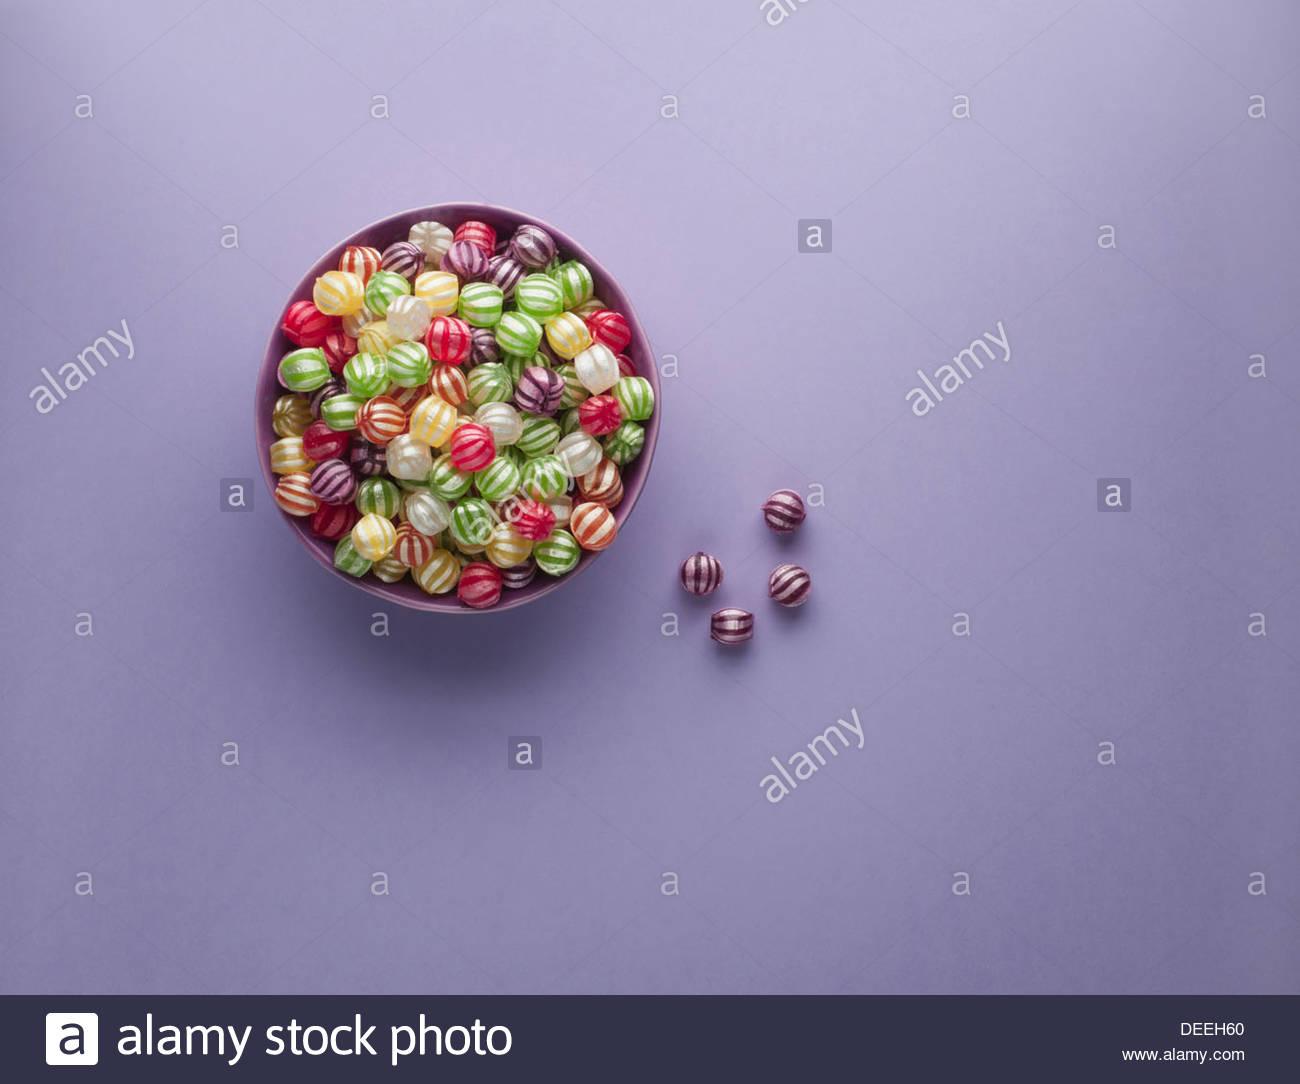 Hard Candy vibrante en la cazoleta Imagen De Stock